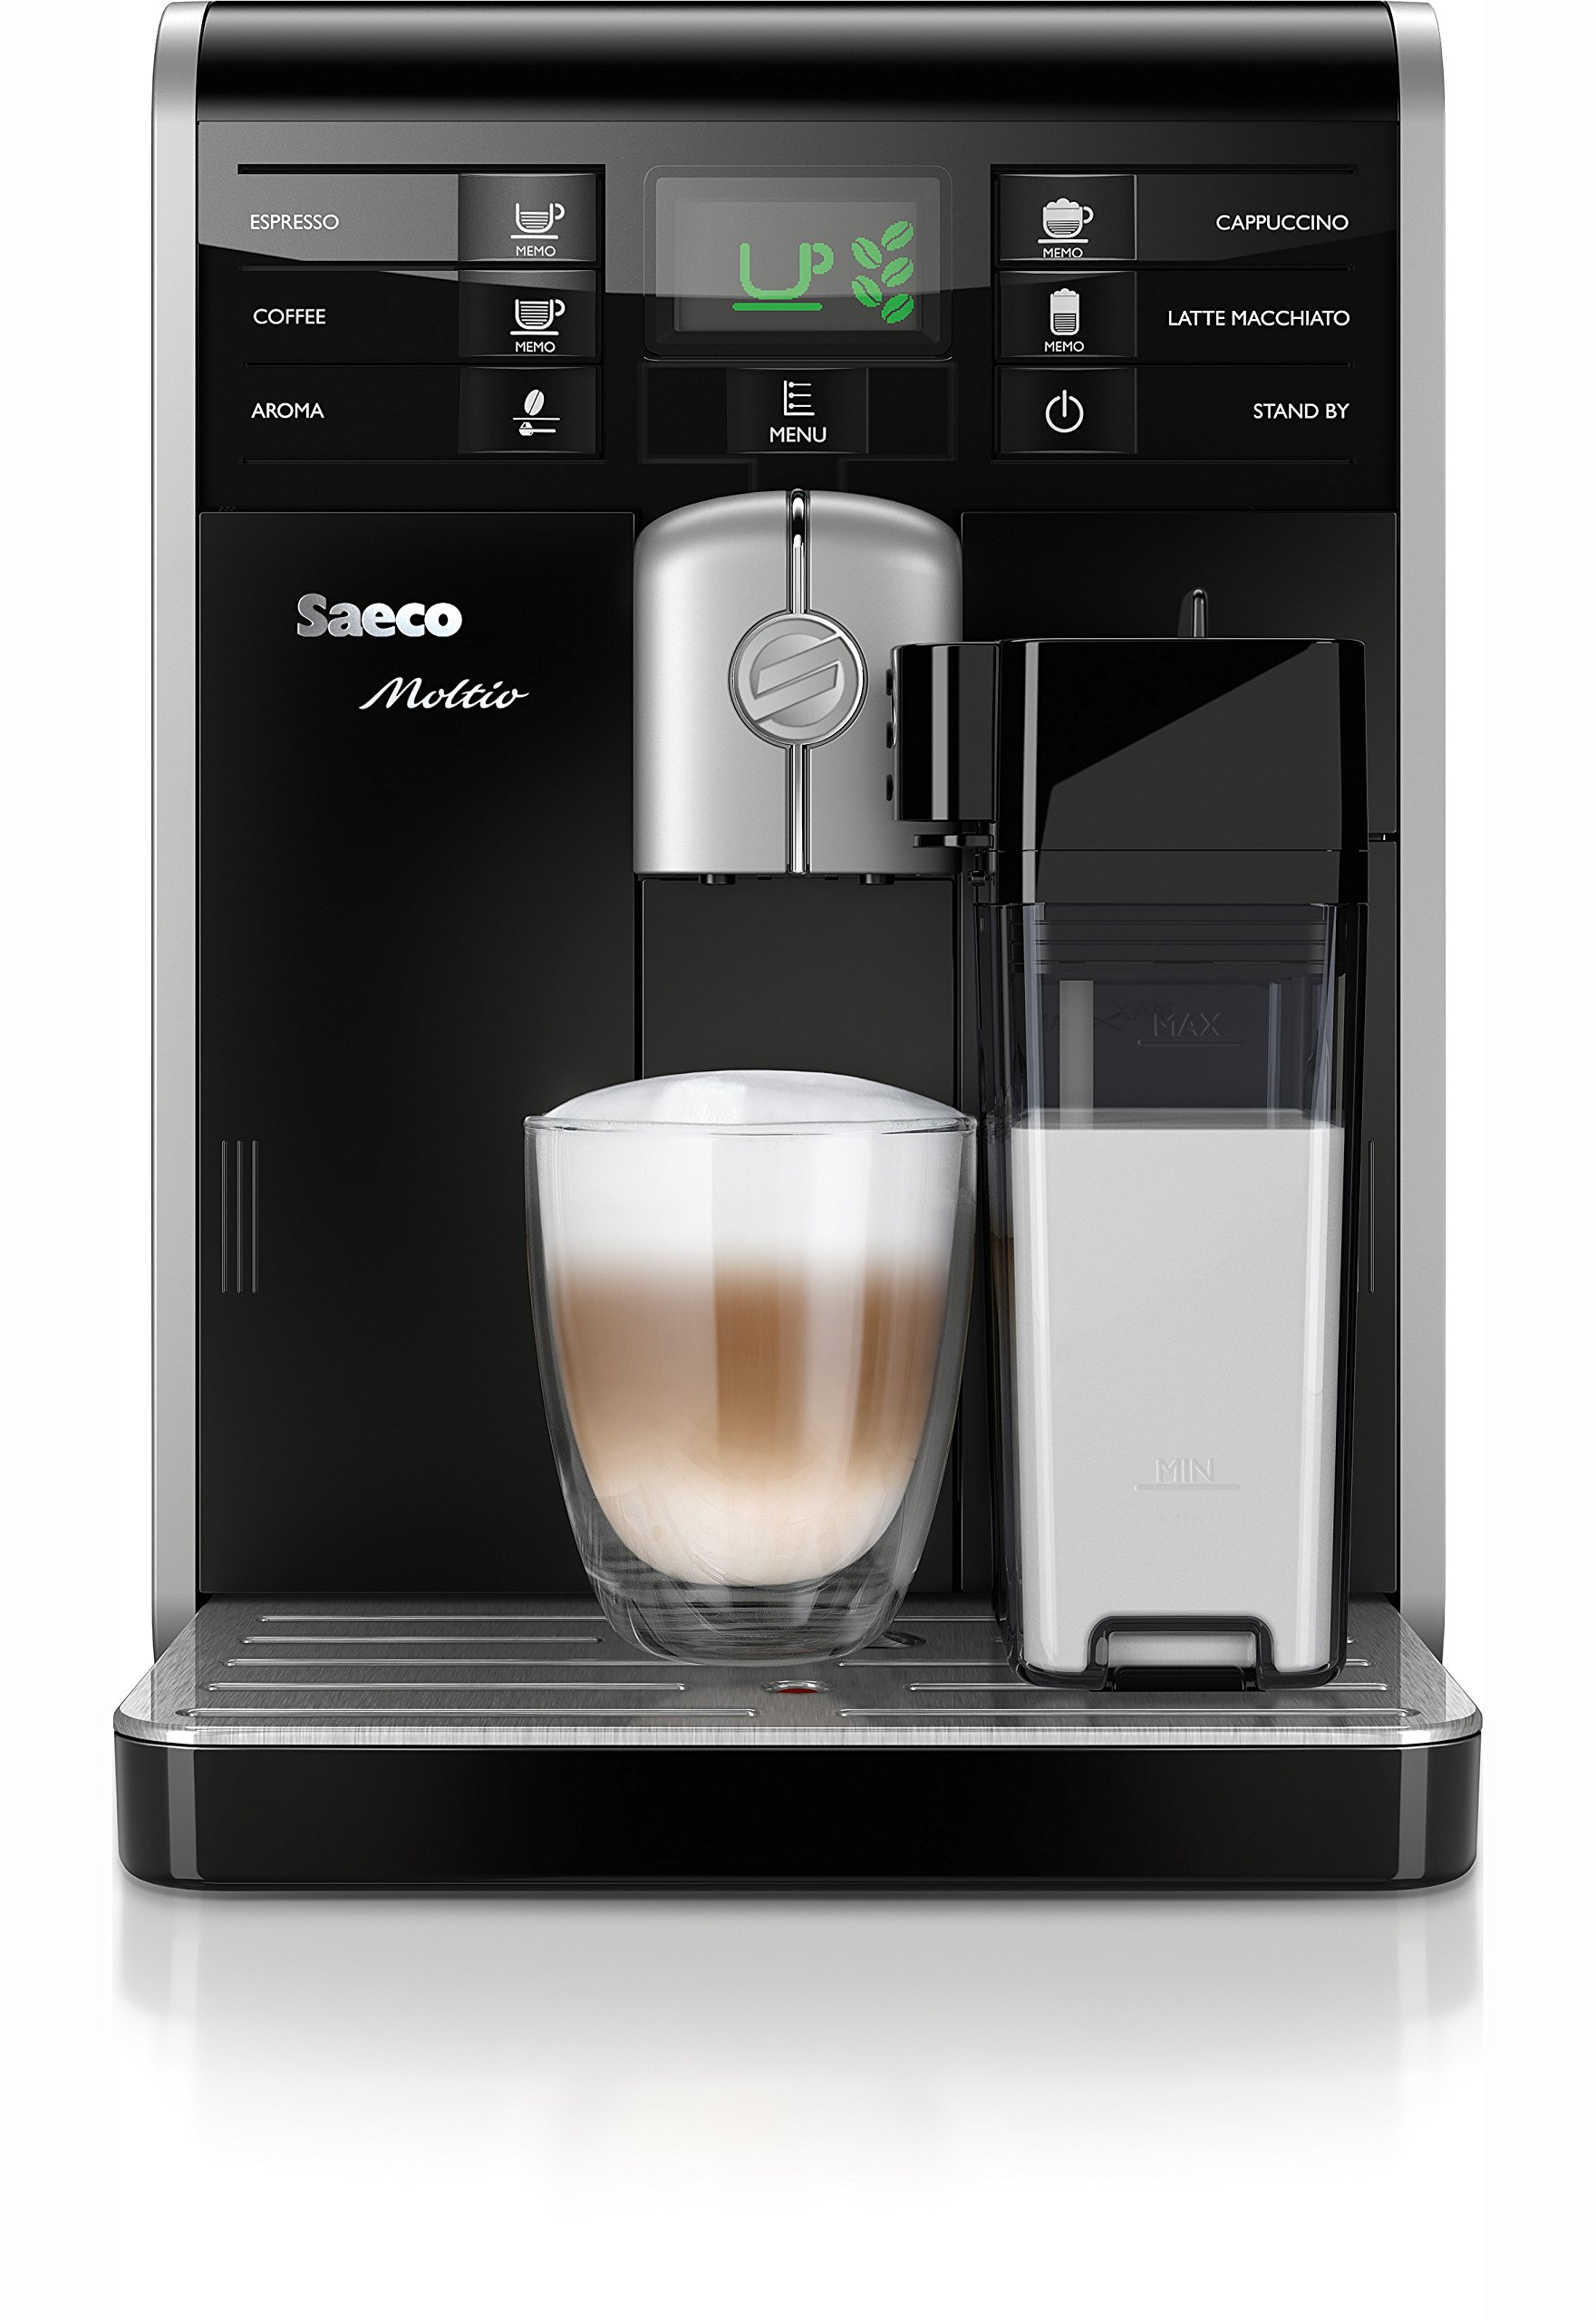 Saeco-Moltio-HD876901-Kaffeevollautomat-1850-W-integrierte-Milchkaraffe-schwarz